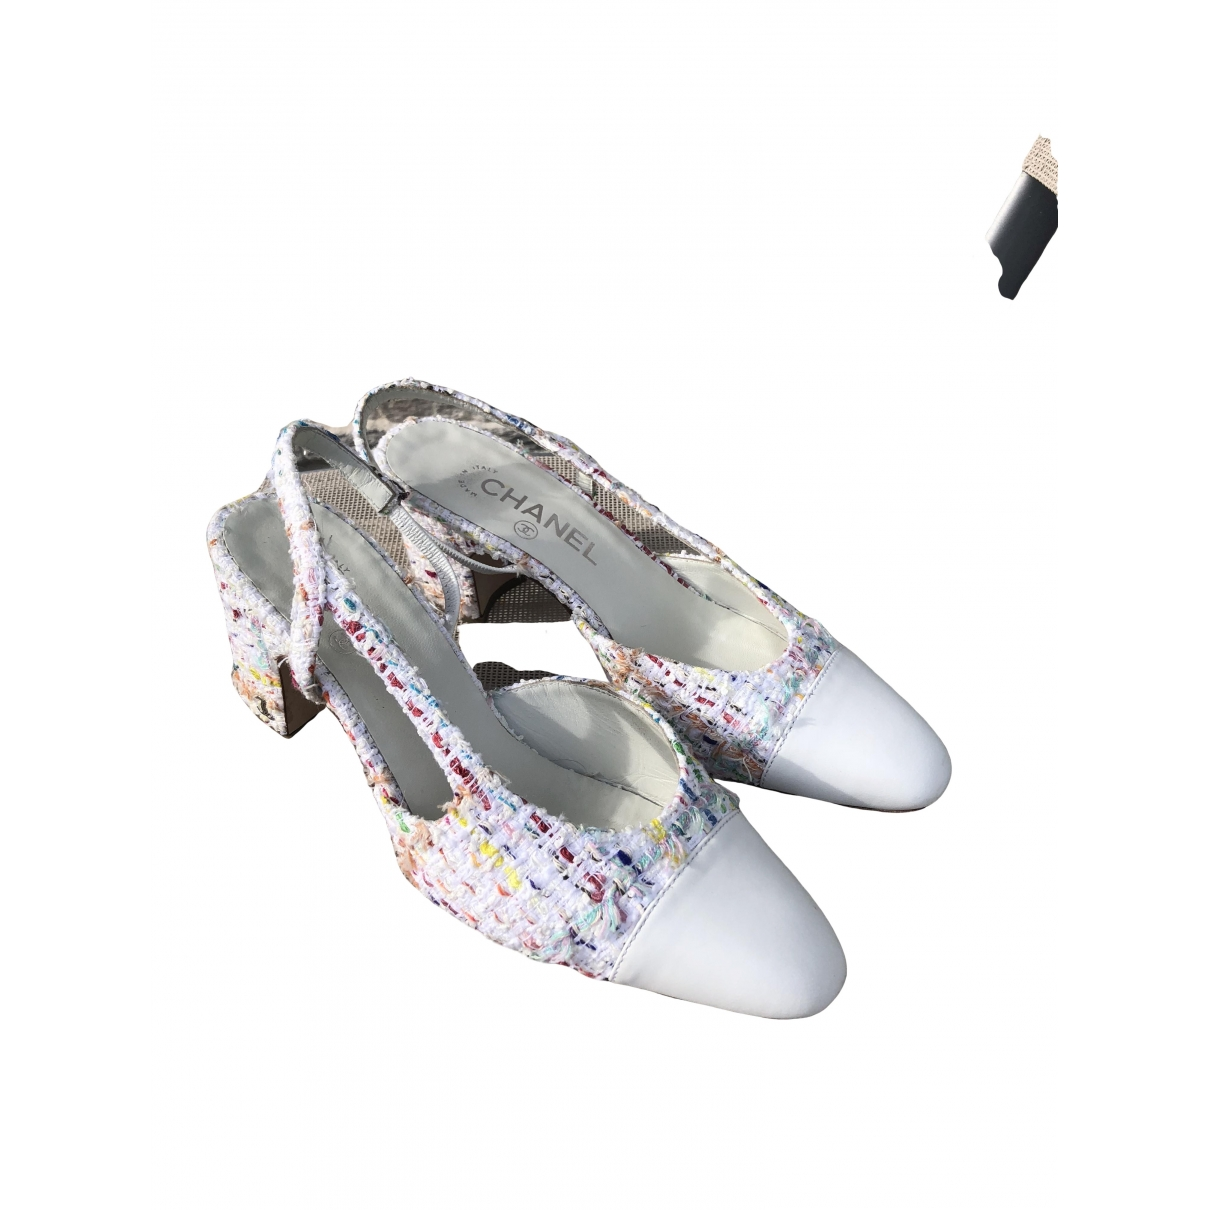 Chanel Slingback White Leather Heels for Women 37.5 EU